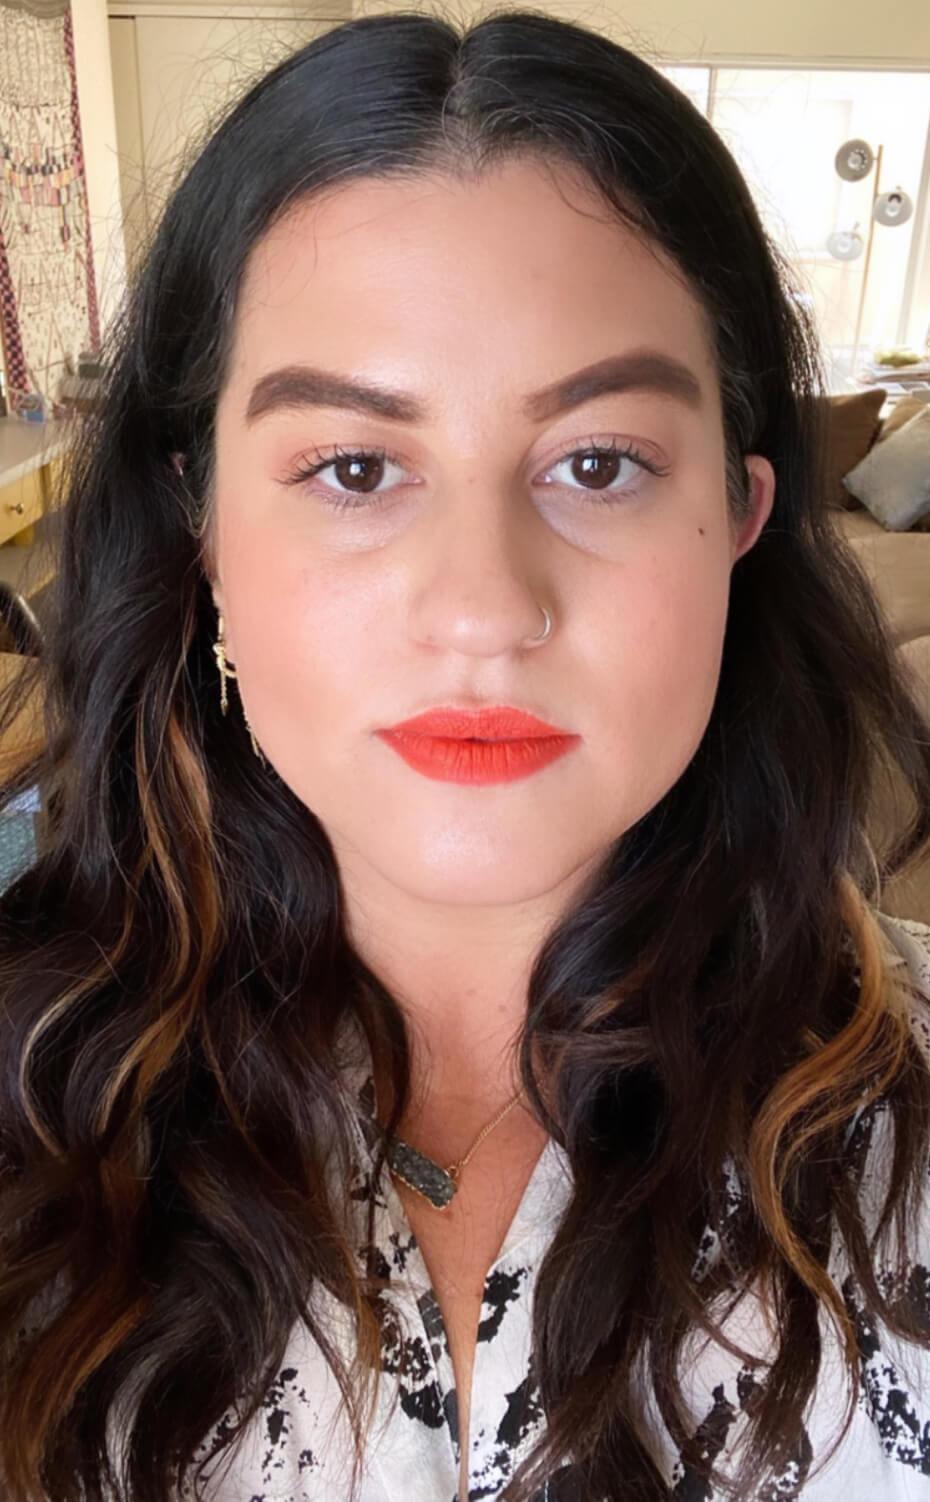 lipstick-kvd-beauty-everlasting-liquid-lipstick-072920-1